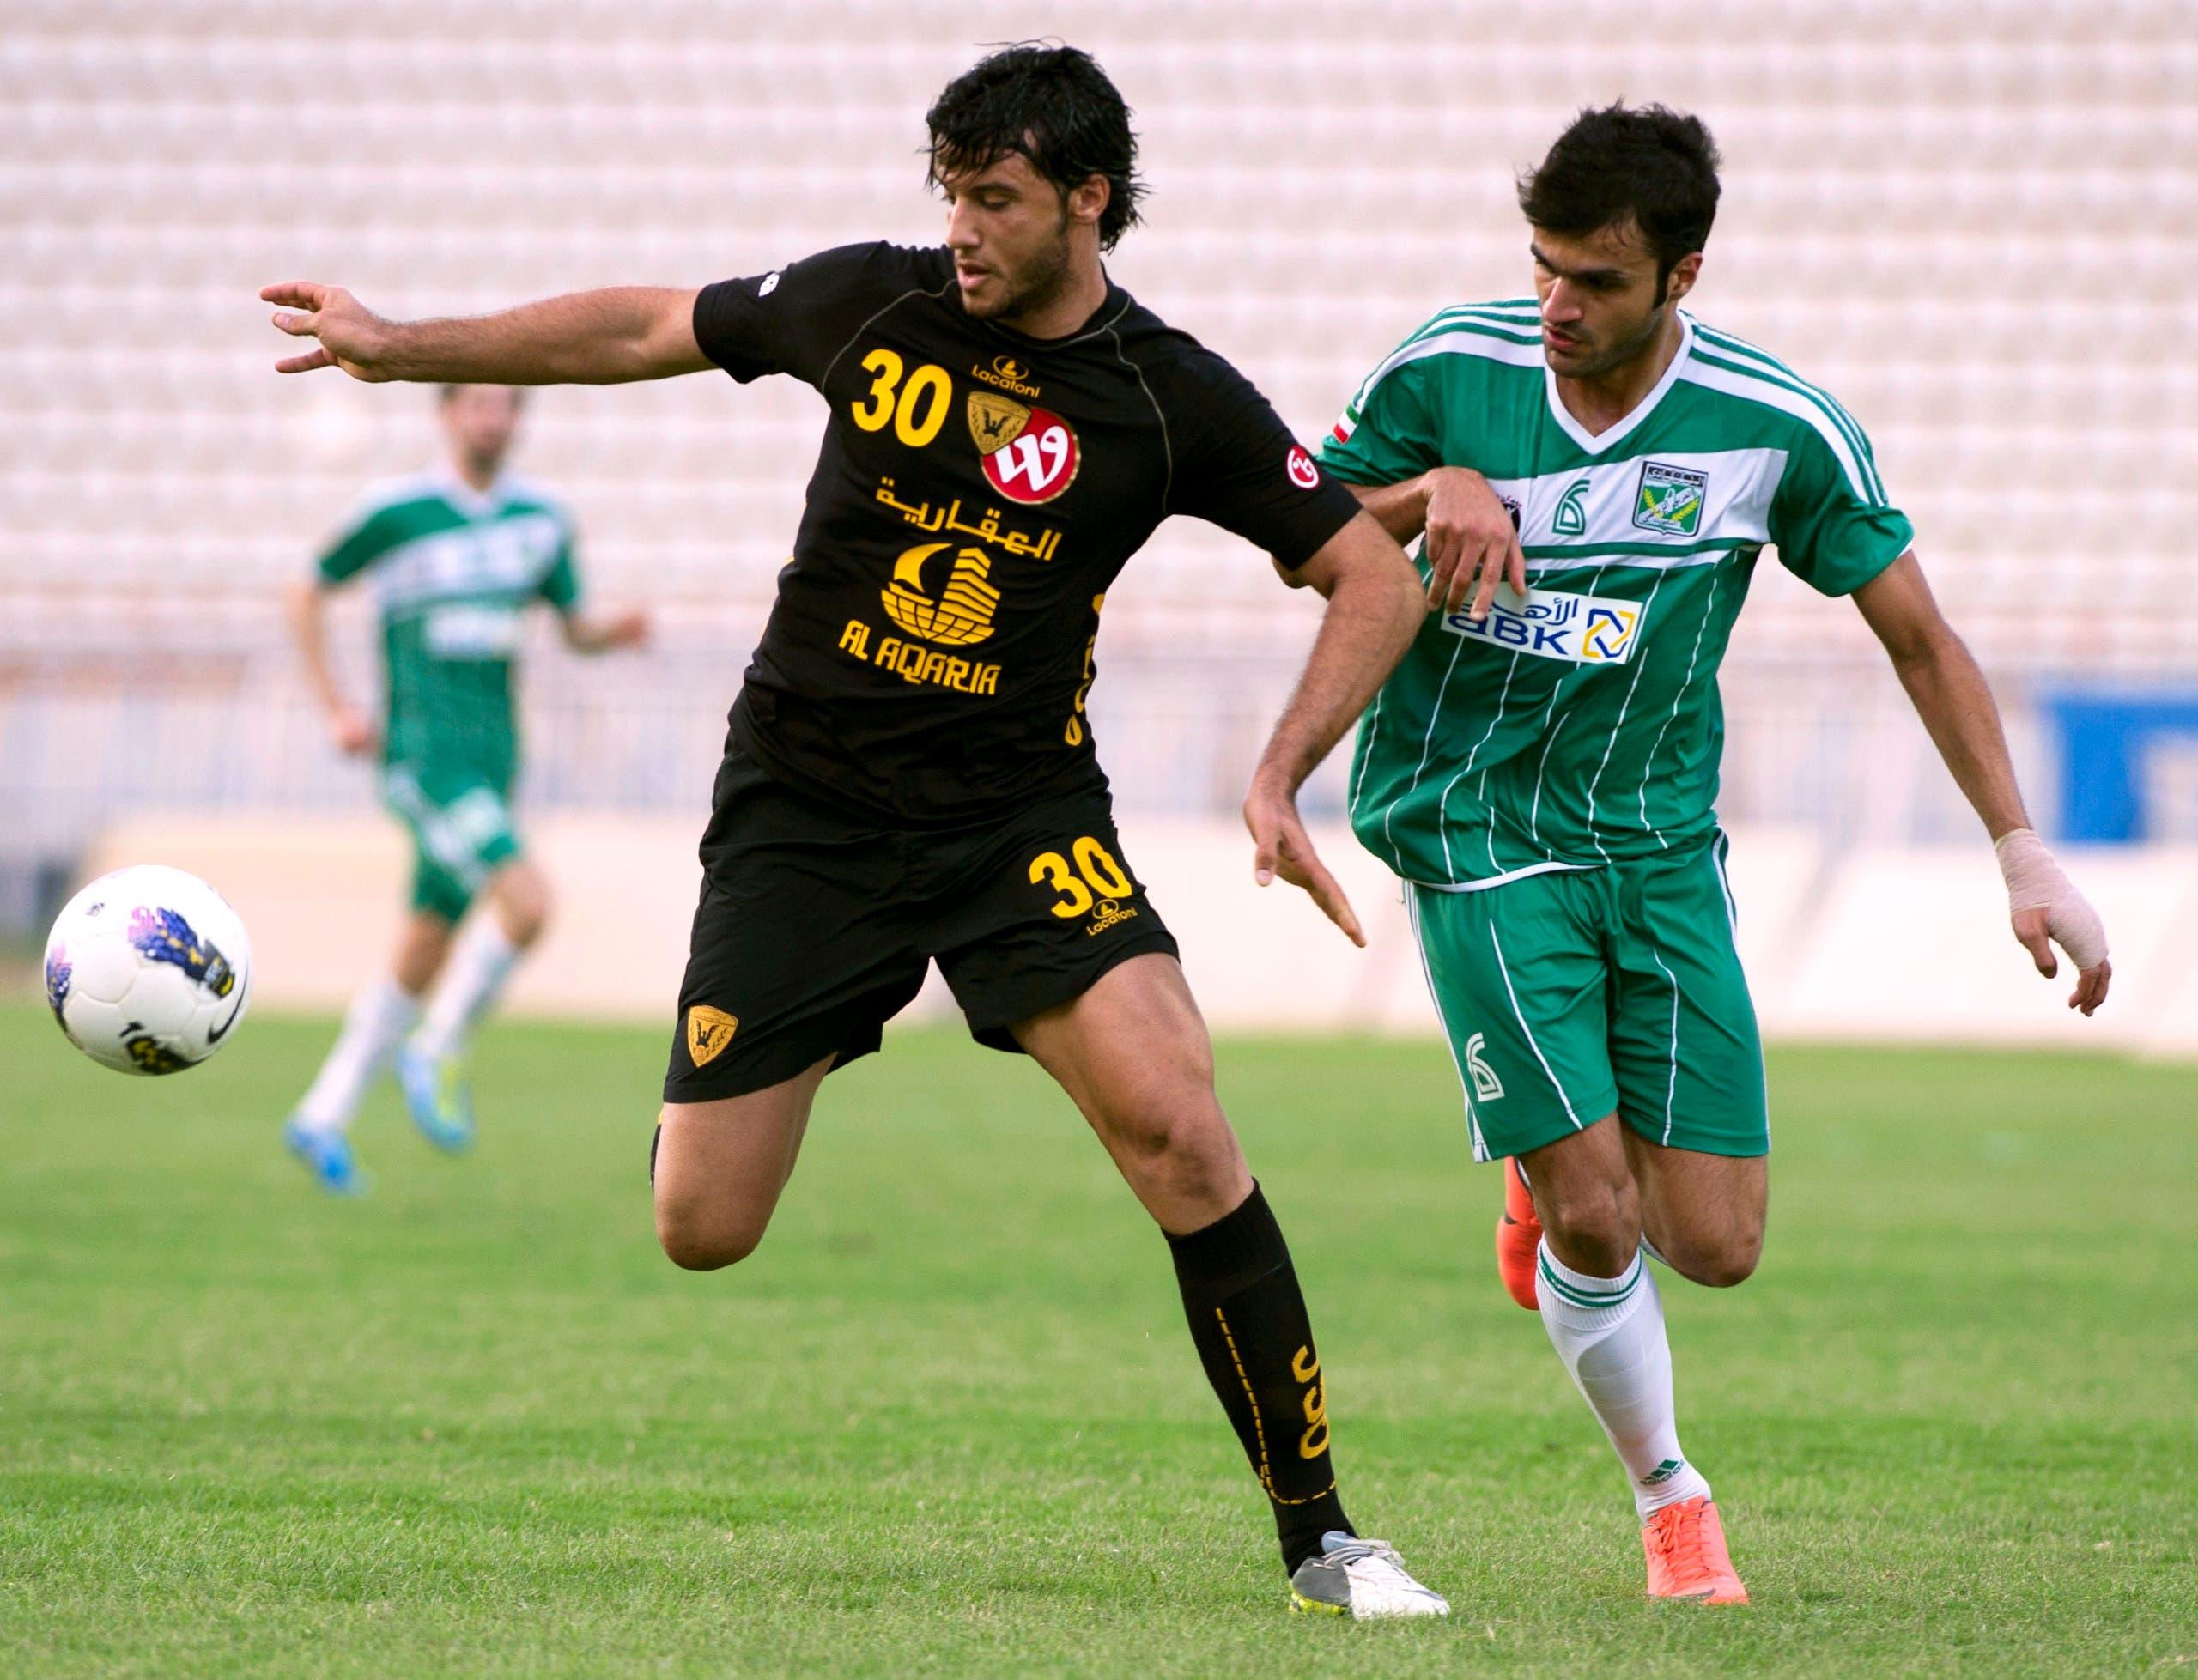 Al Qadsia's Omar Al Somah (L) challenges Al Arabi's Ahmed Abdulgafor during their Premier League soccer match in Kuwait City May 5, 2012. REUTERS